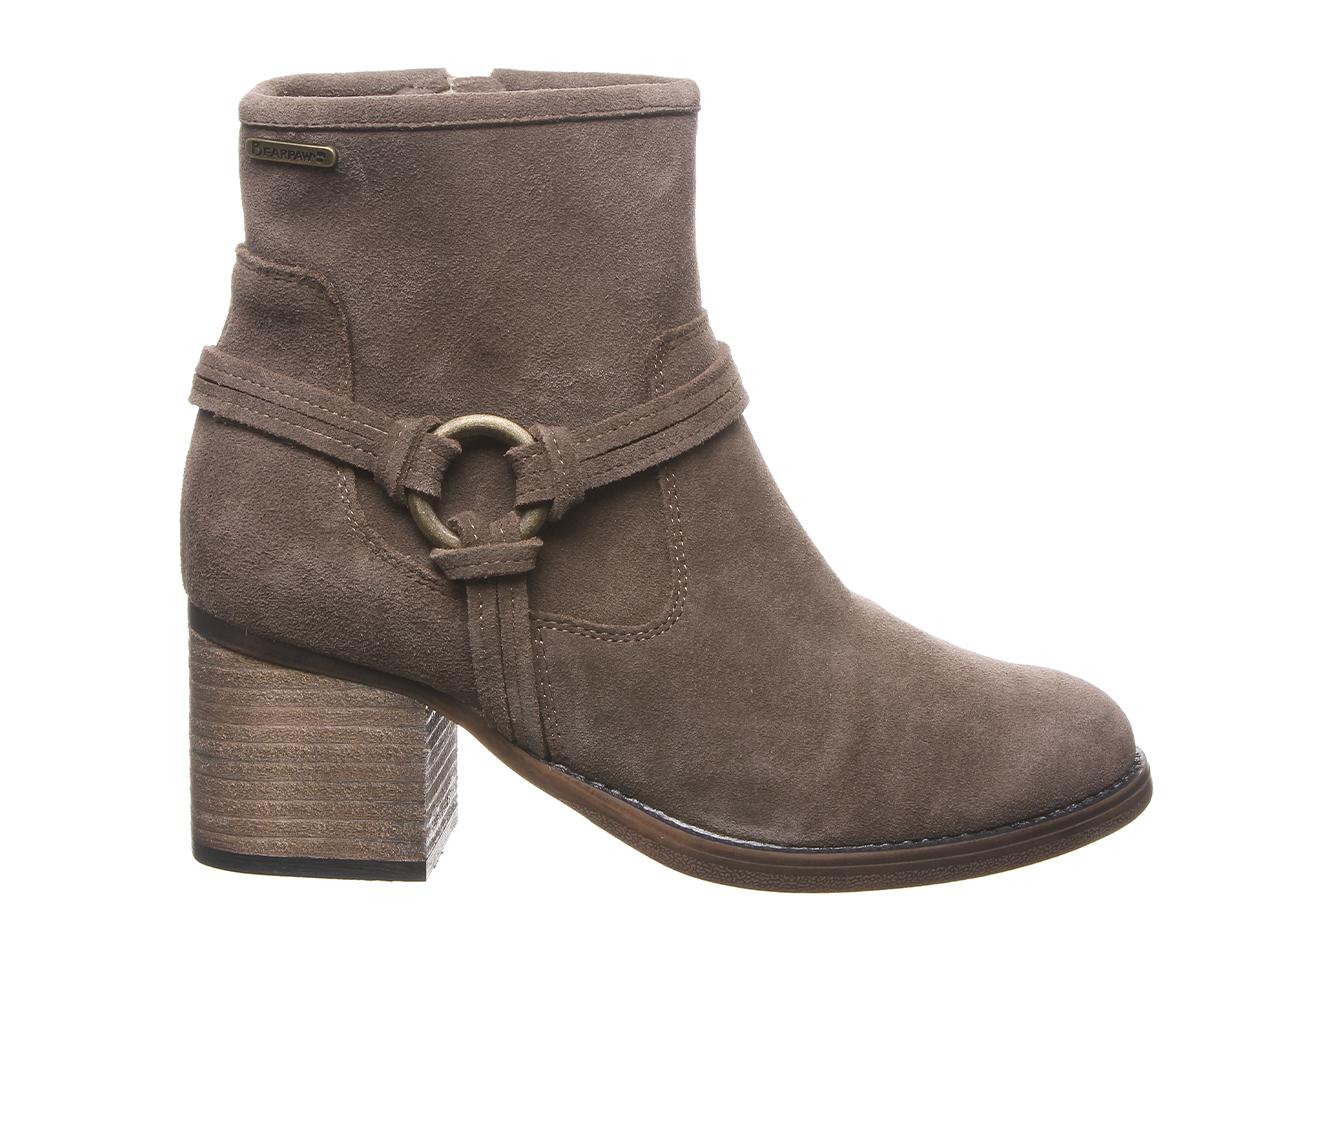 Bearpaw Mica Women's Boot (Brown Suede)